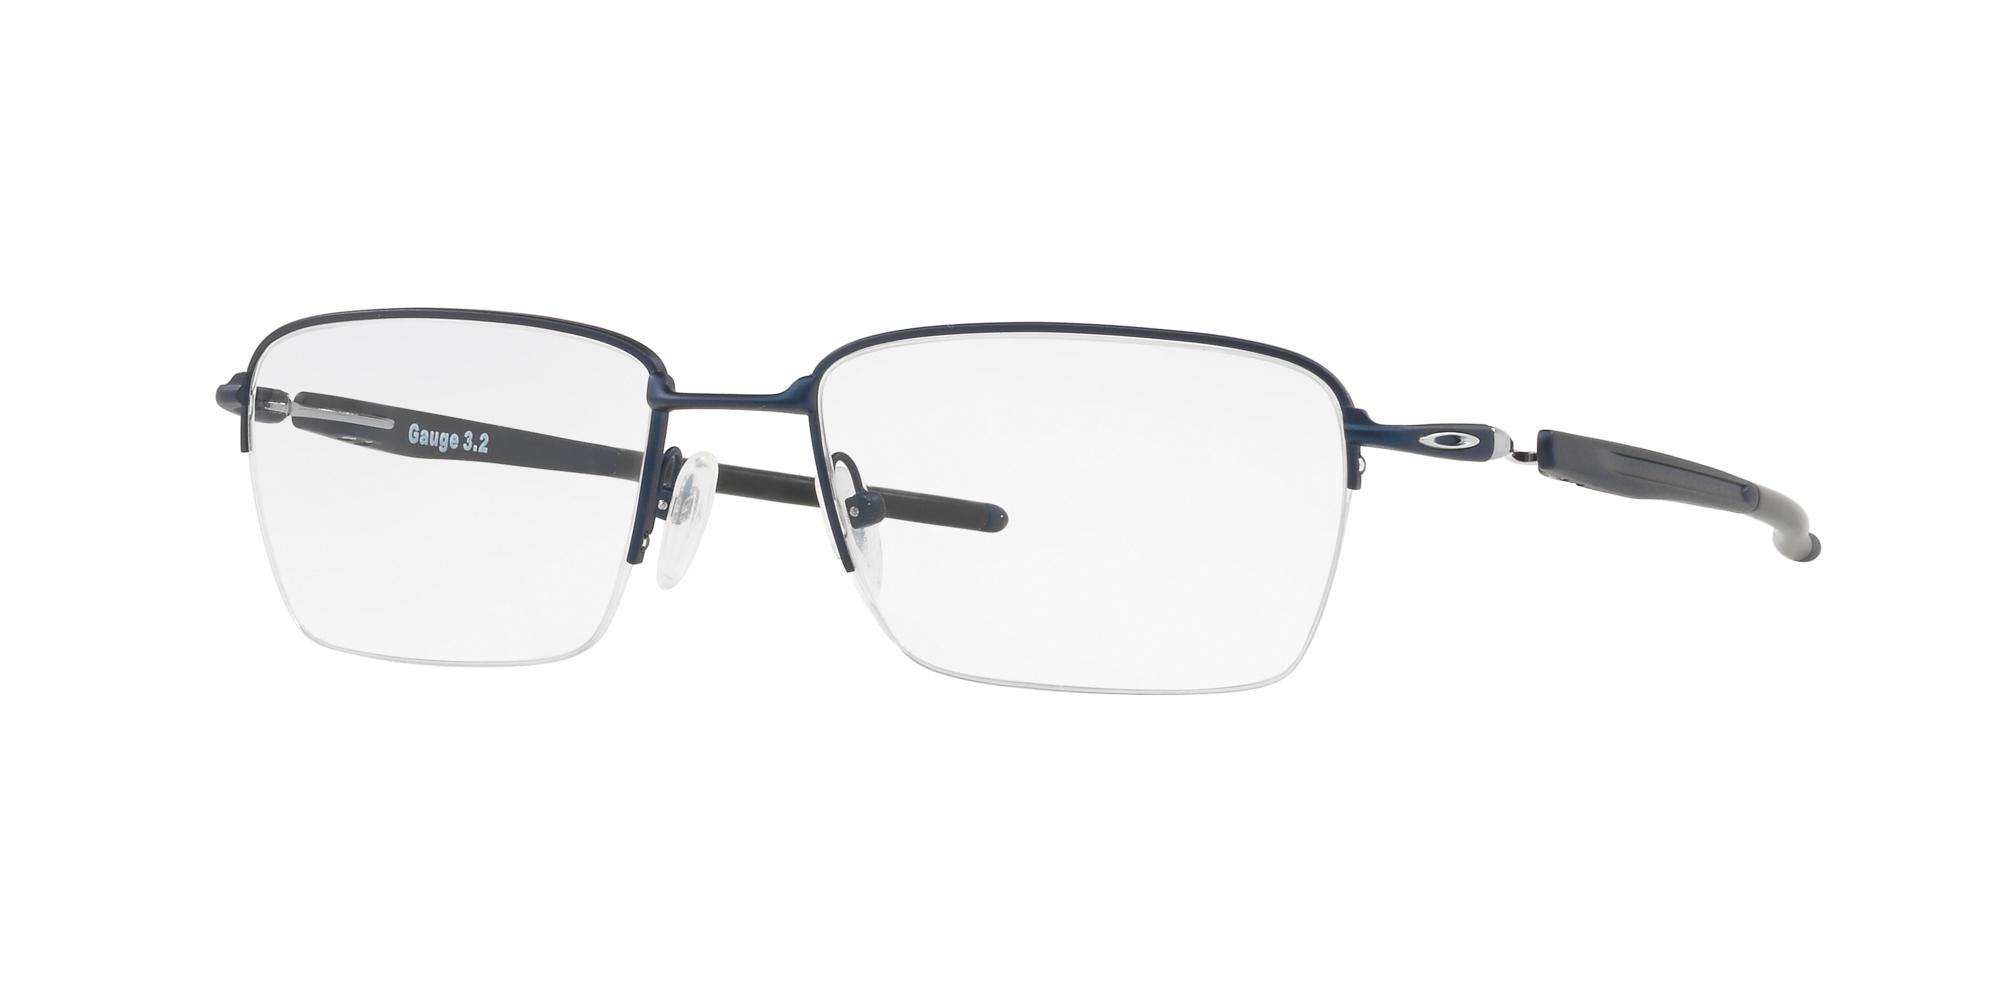 Oakley eyeglasses GAUGE 3.2 BLADE OX 5128